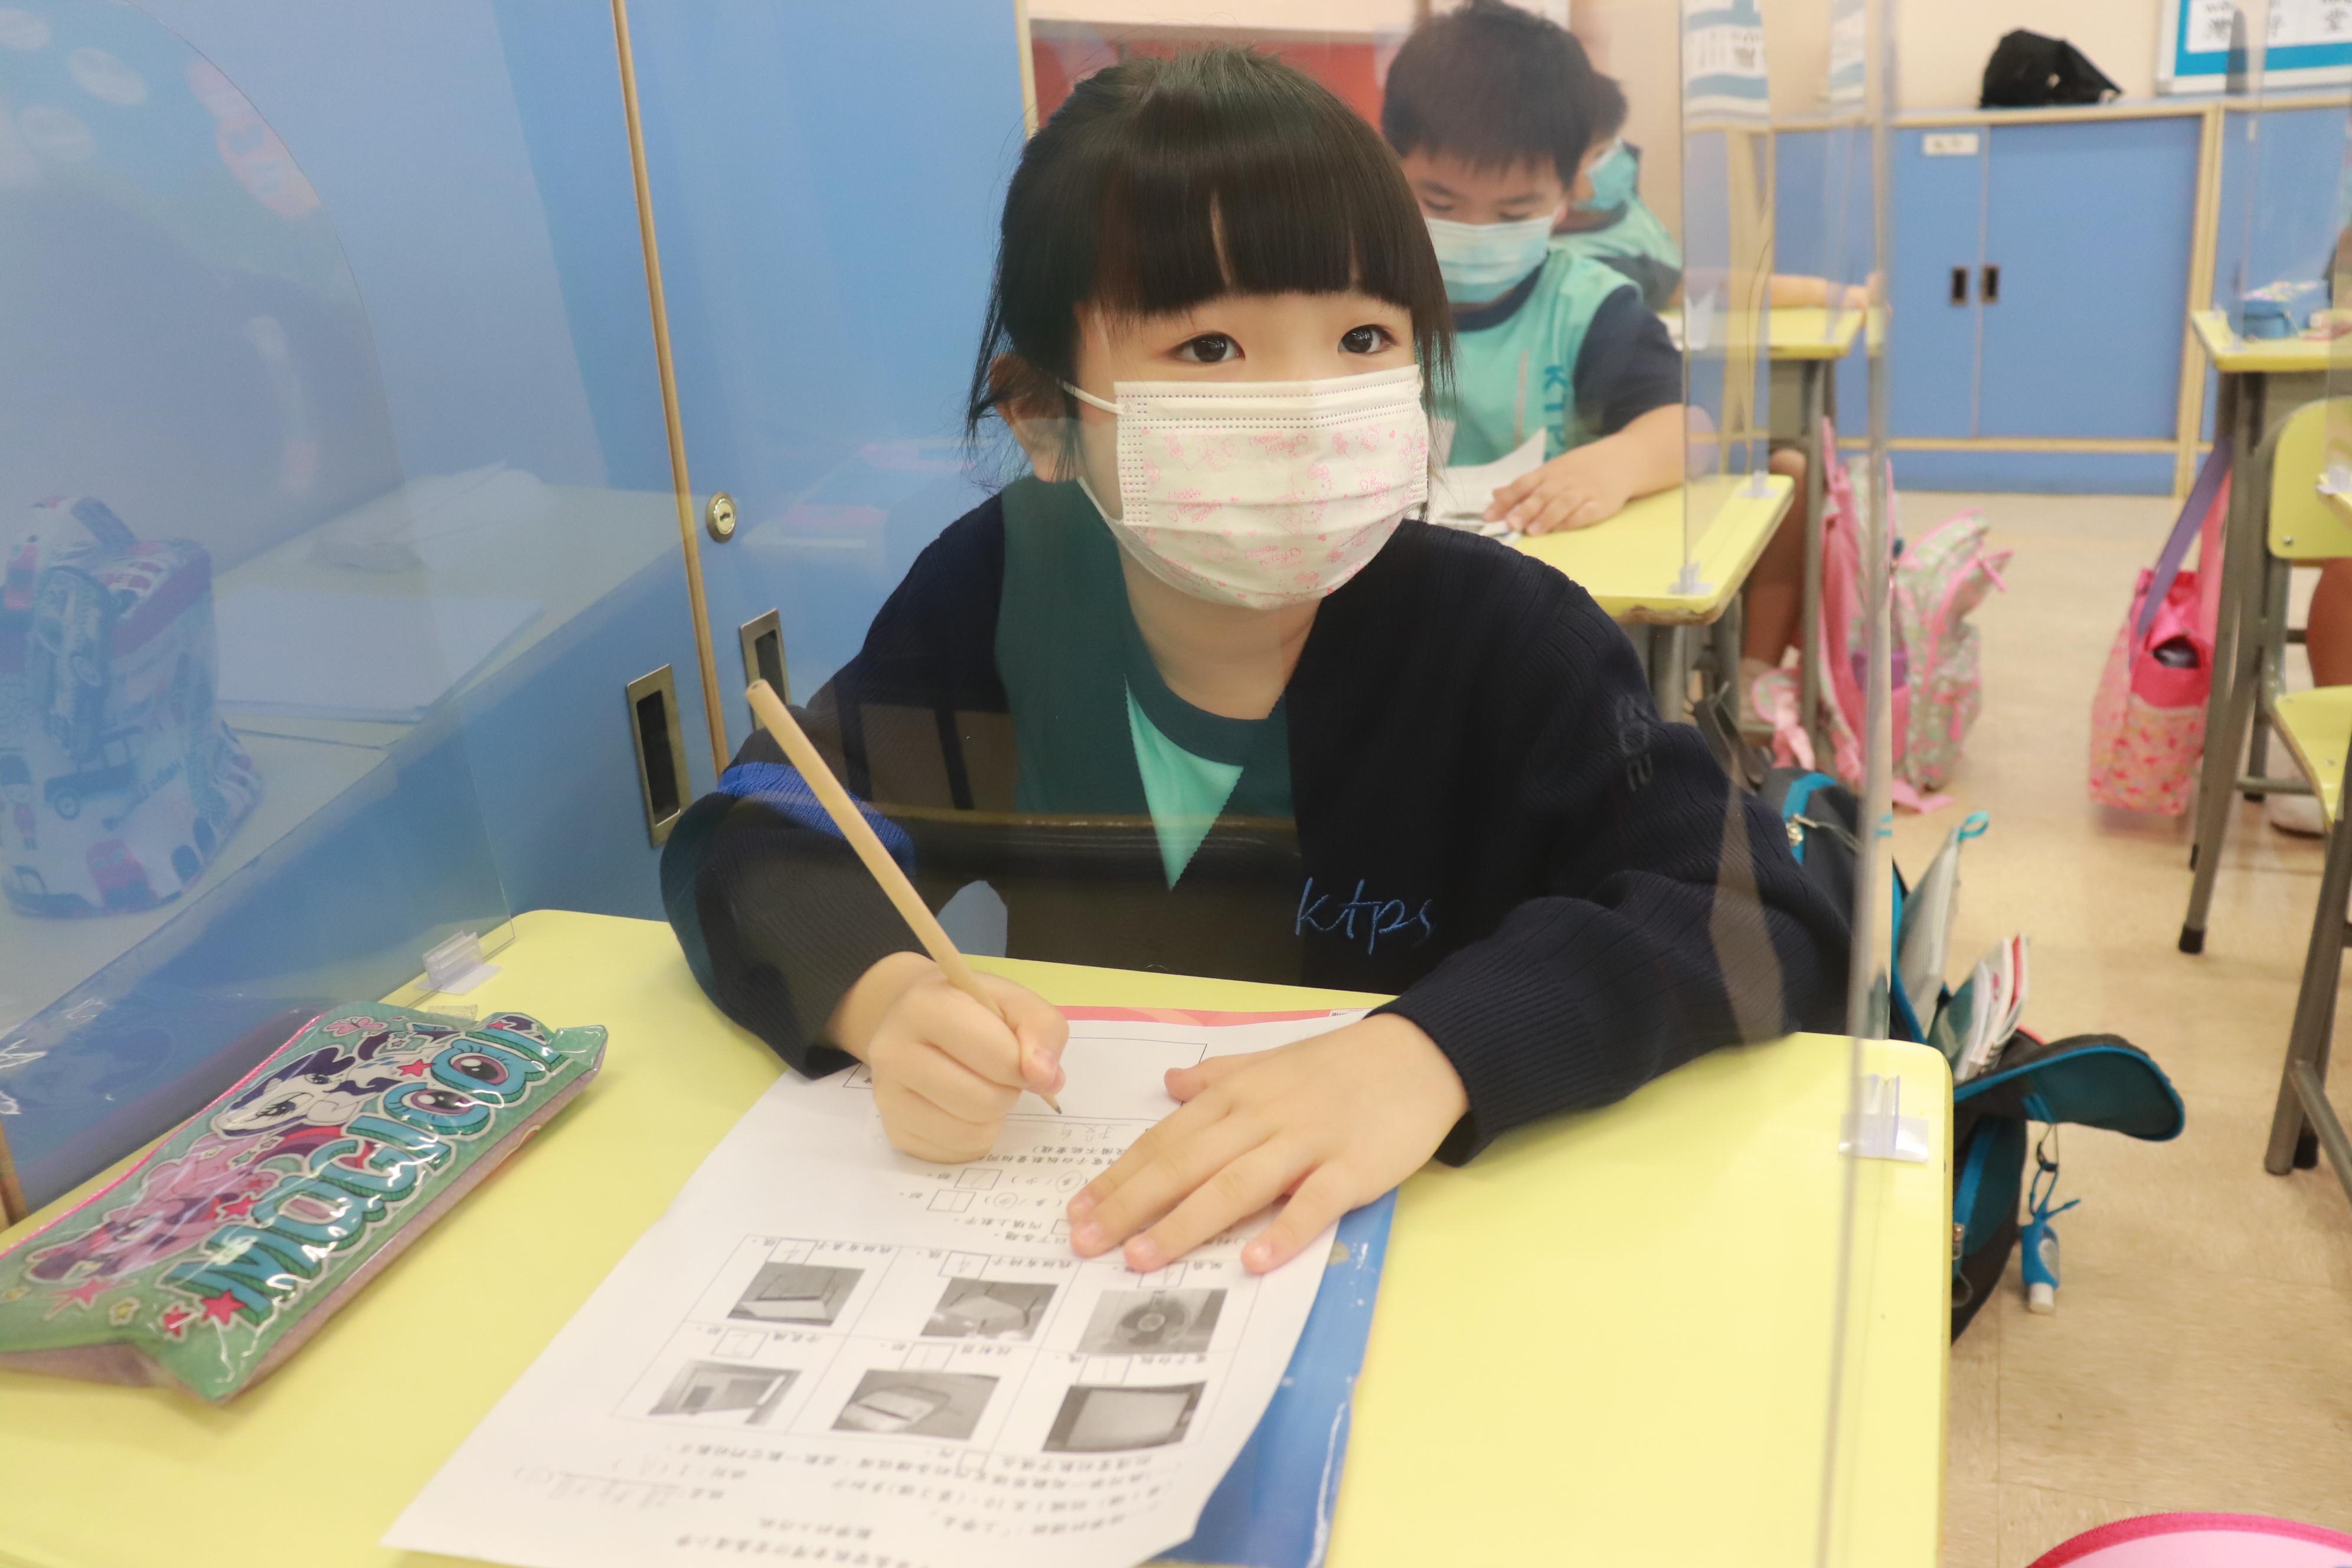 http://keito.school.hk/sites/default/files/img_6212.jpg